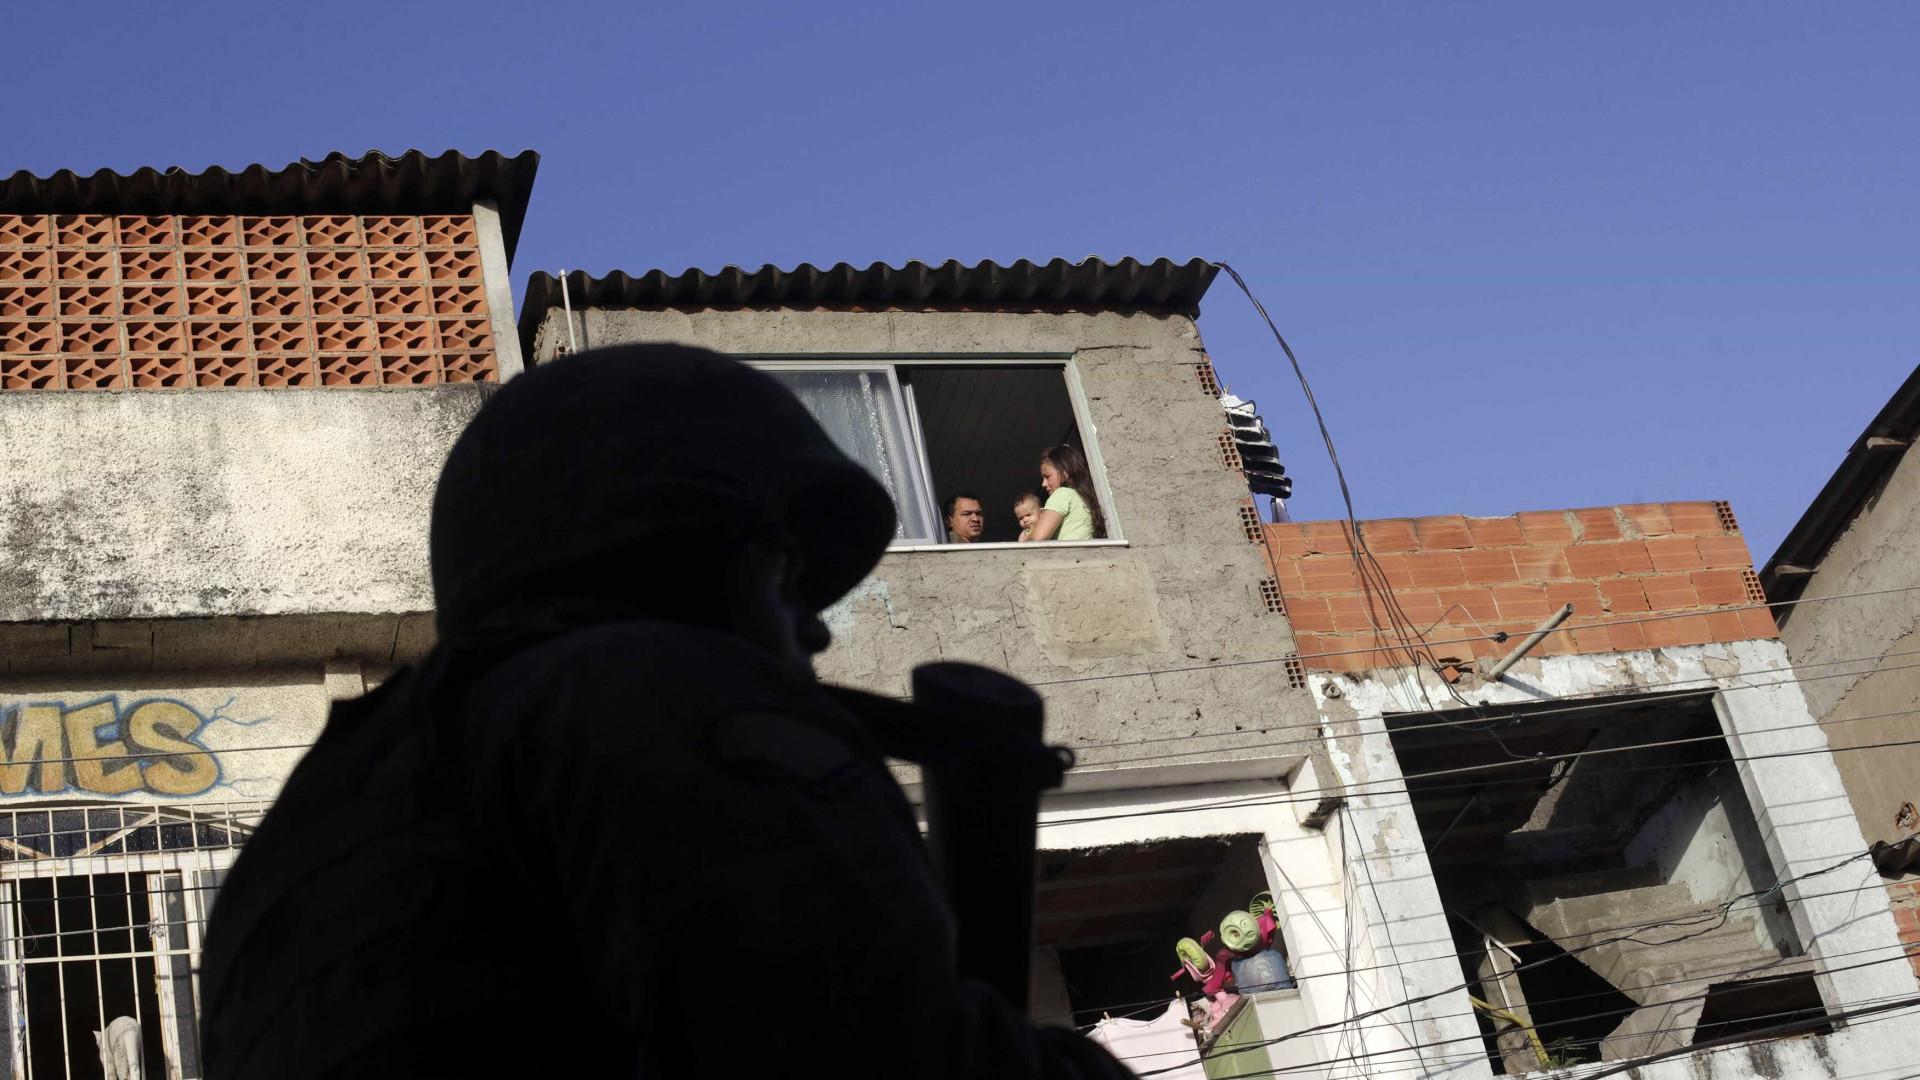 Polícia Militar ocupa comunidades da zona oeste do Rio